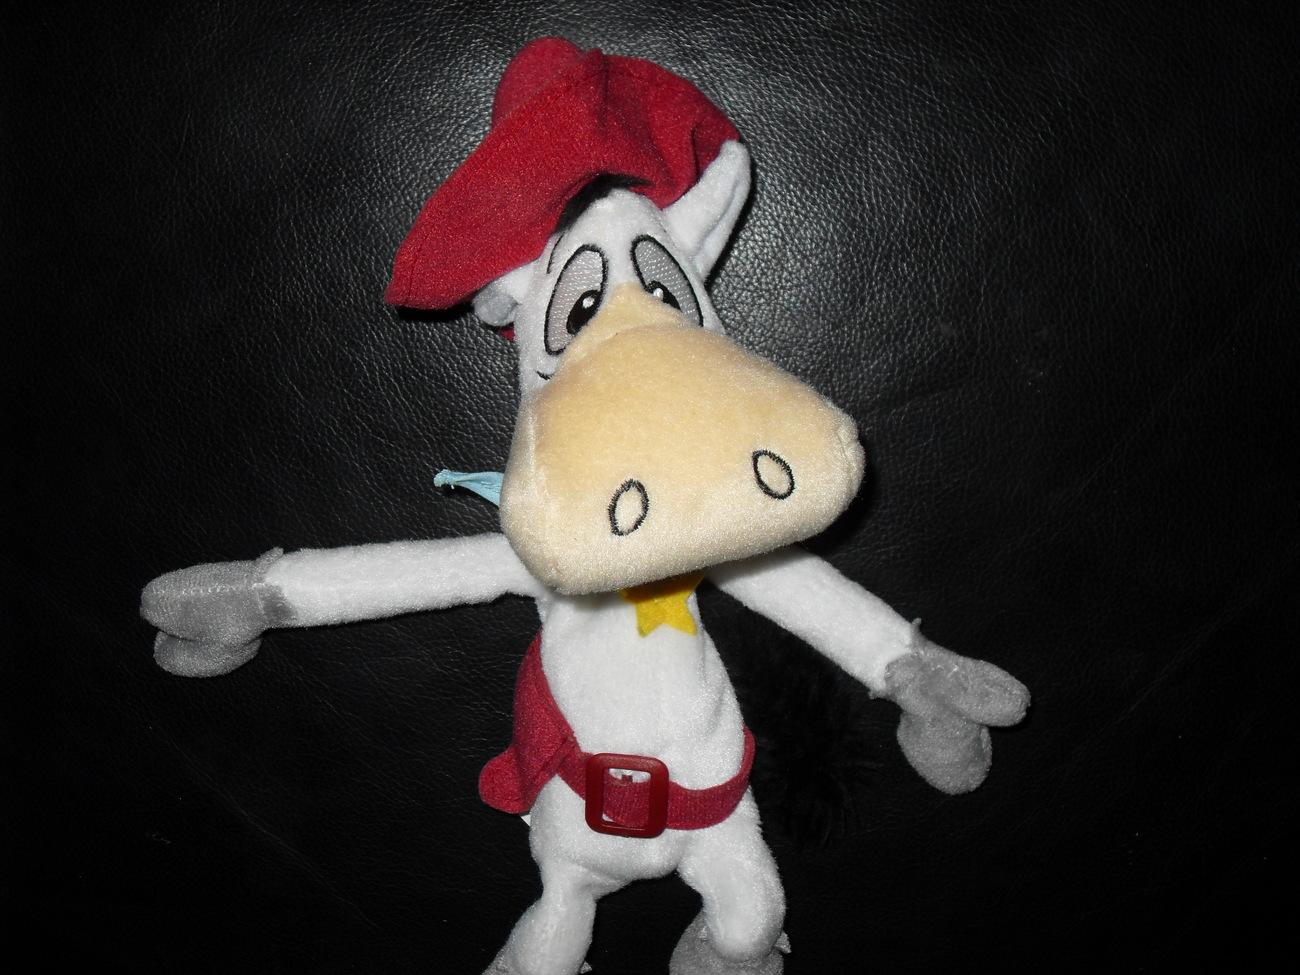 1998 Warner Bros Quick Draw McGraw Plush Toy